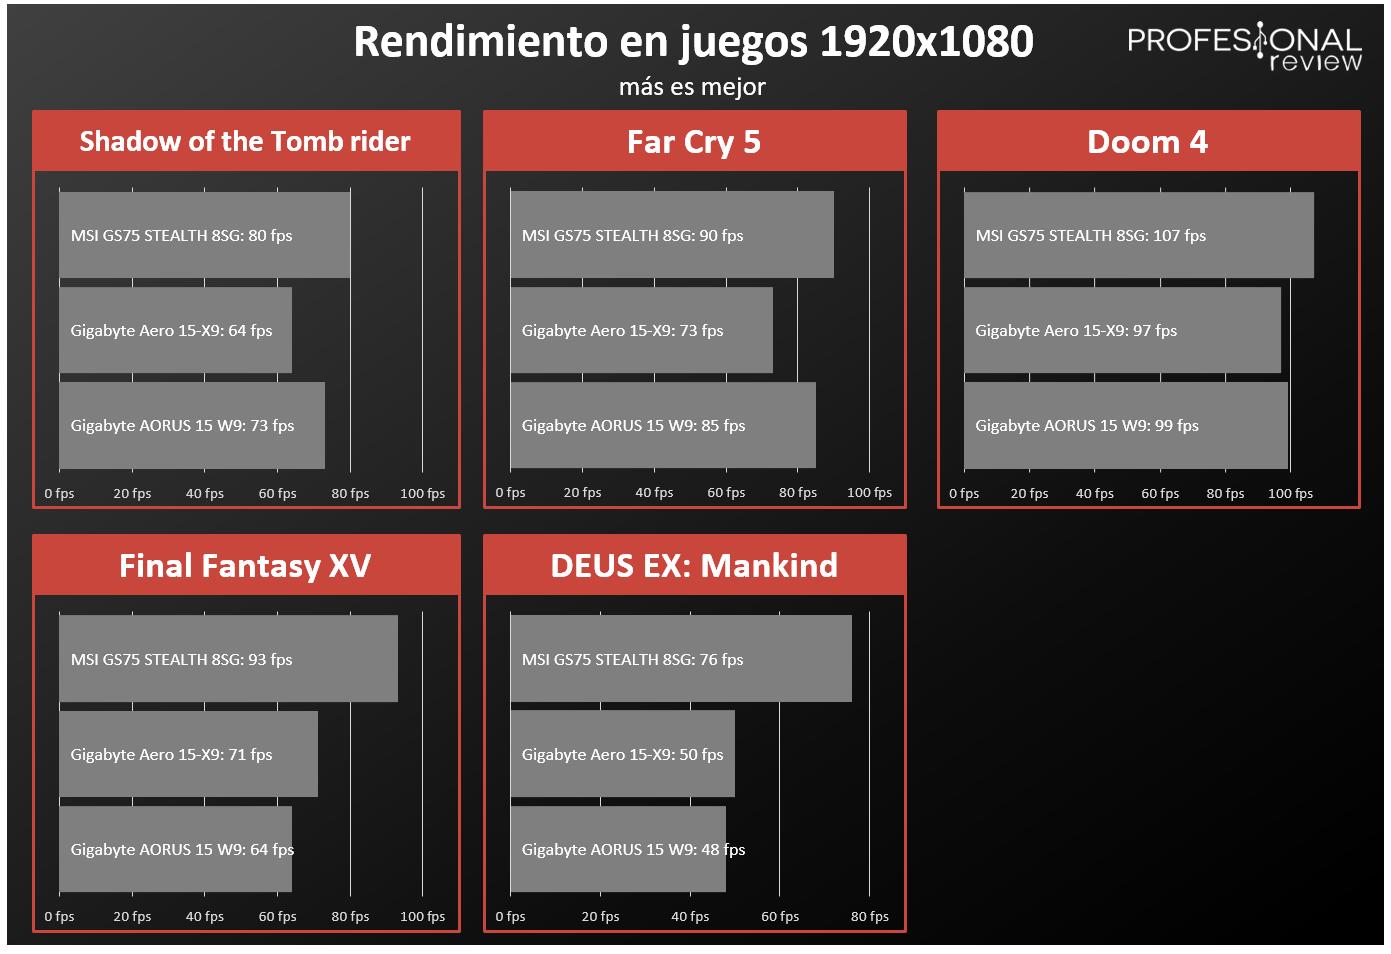 ▷ Nvidia RTX 2060 Max-Q vs RTX 2070 Max-Q vs RTX 2080 Max-Q